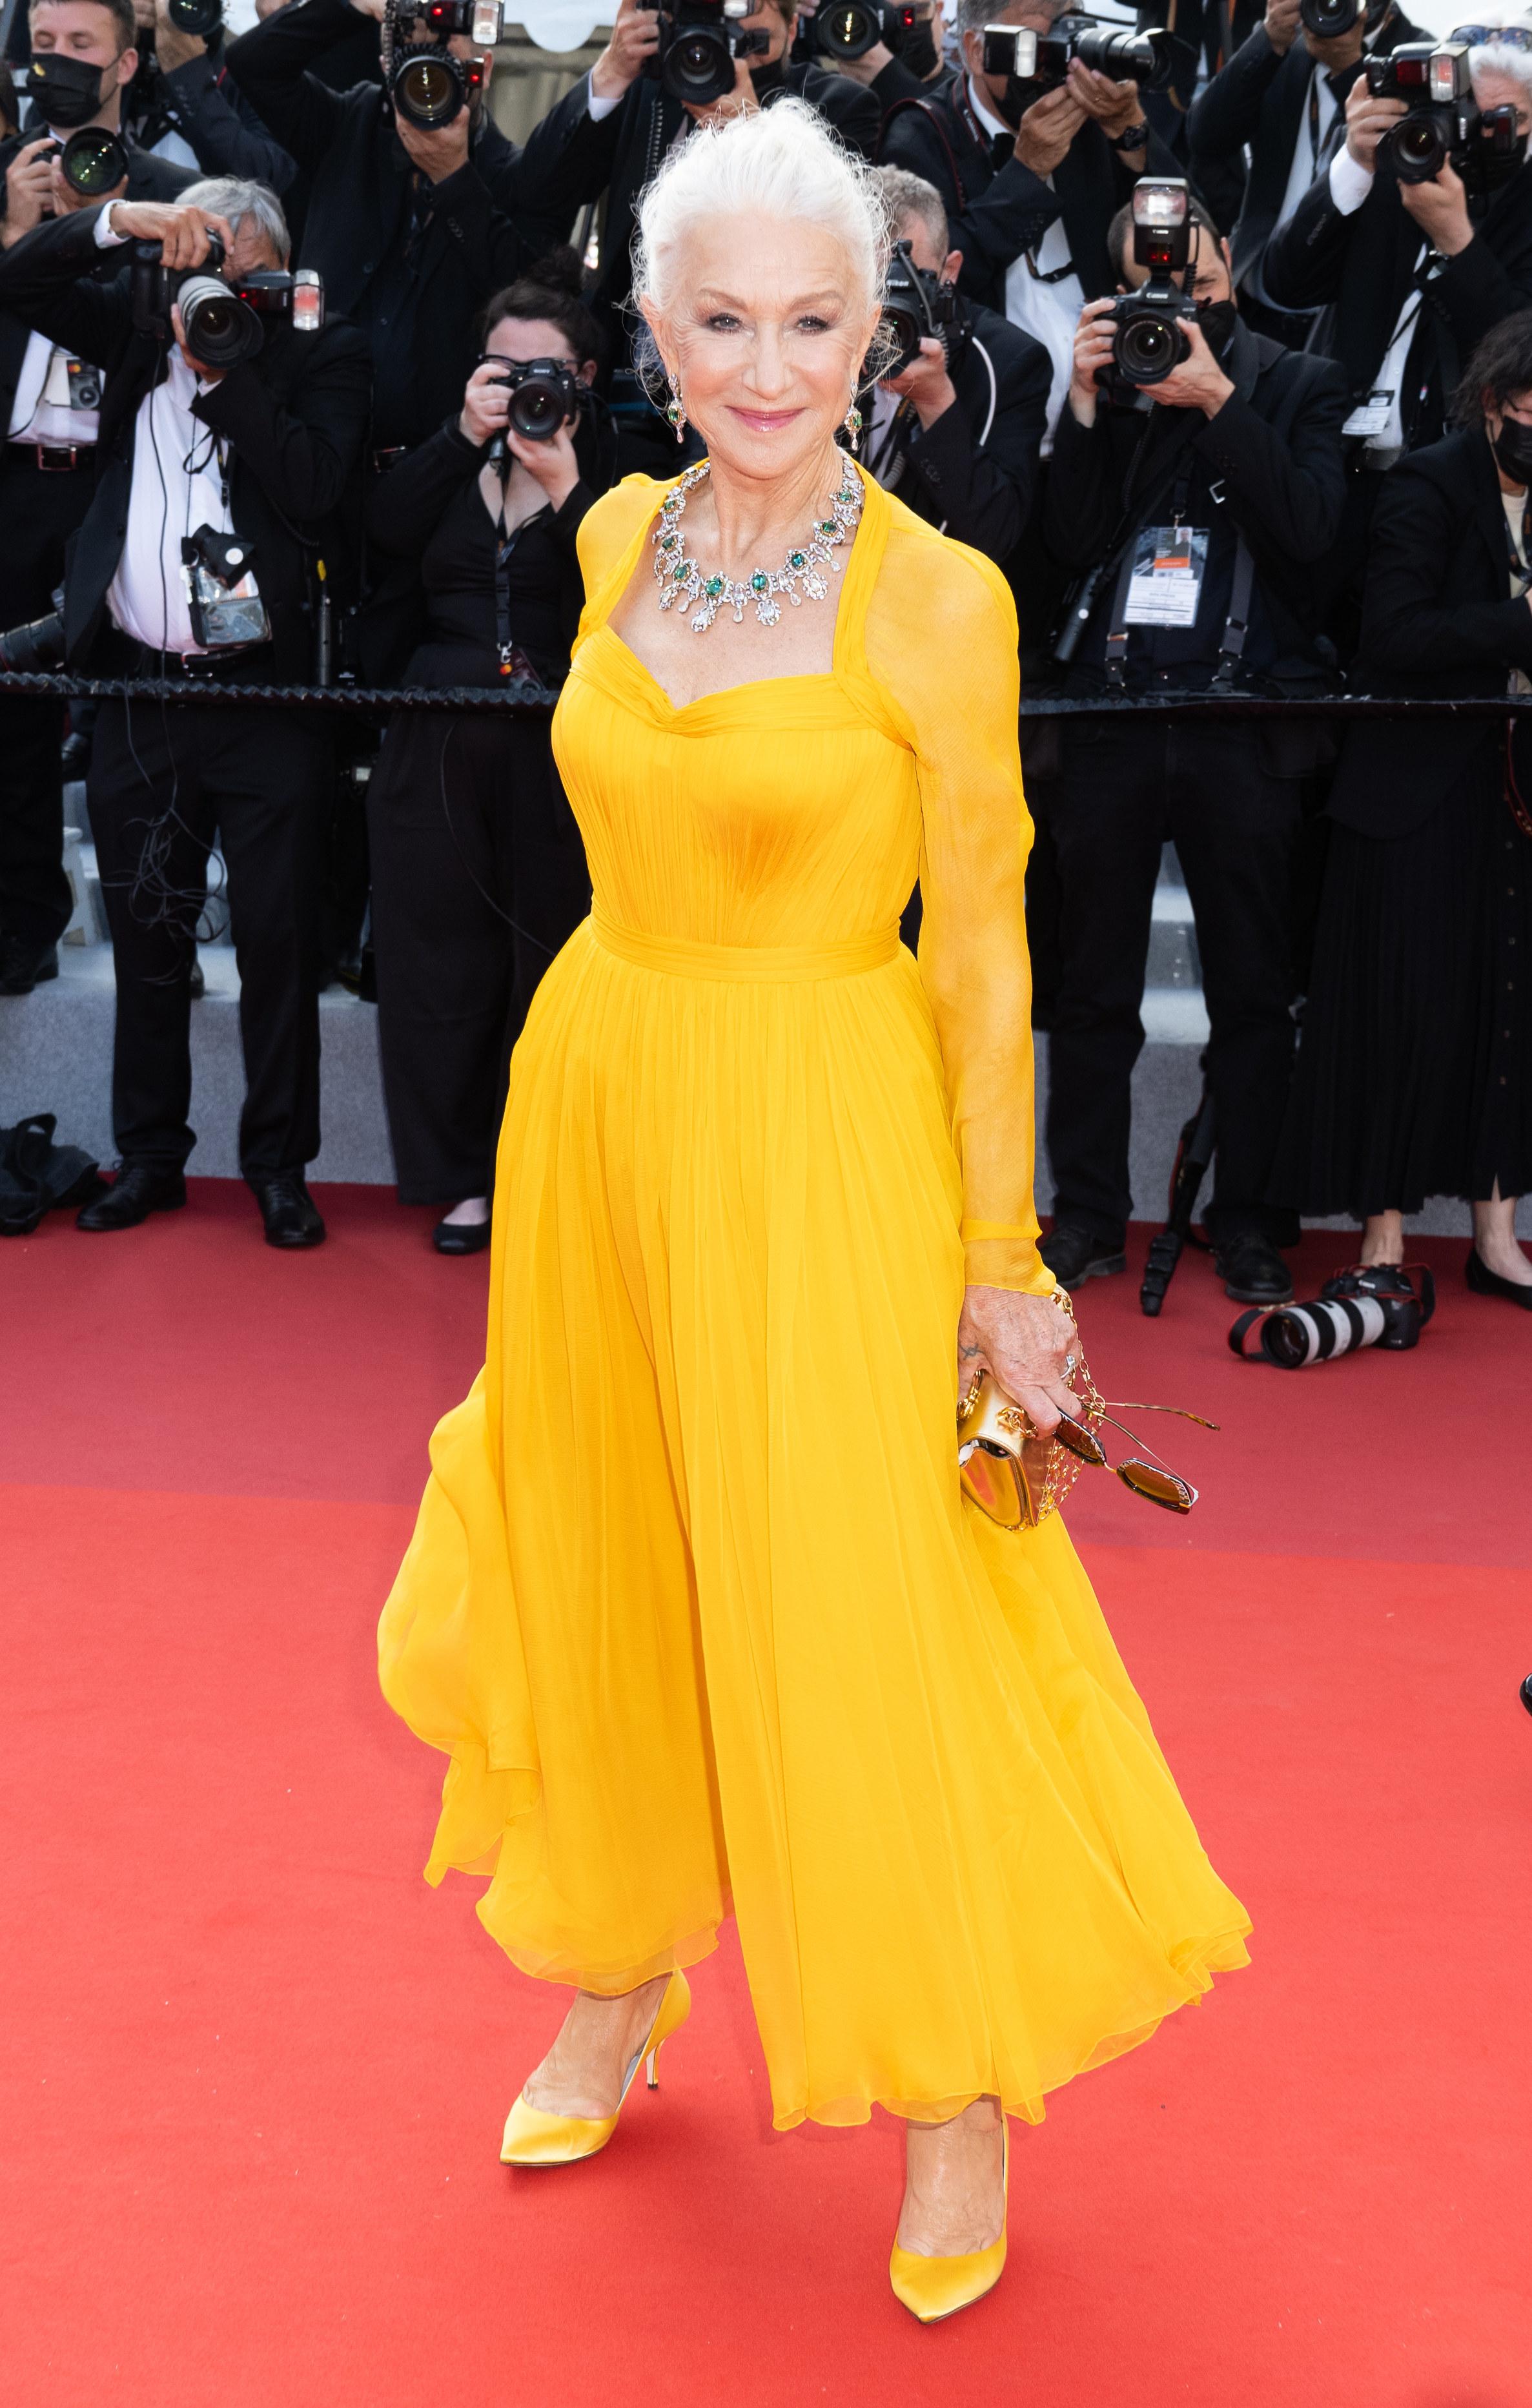 Helen Mirren at the Cannes Film Festival